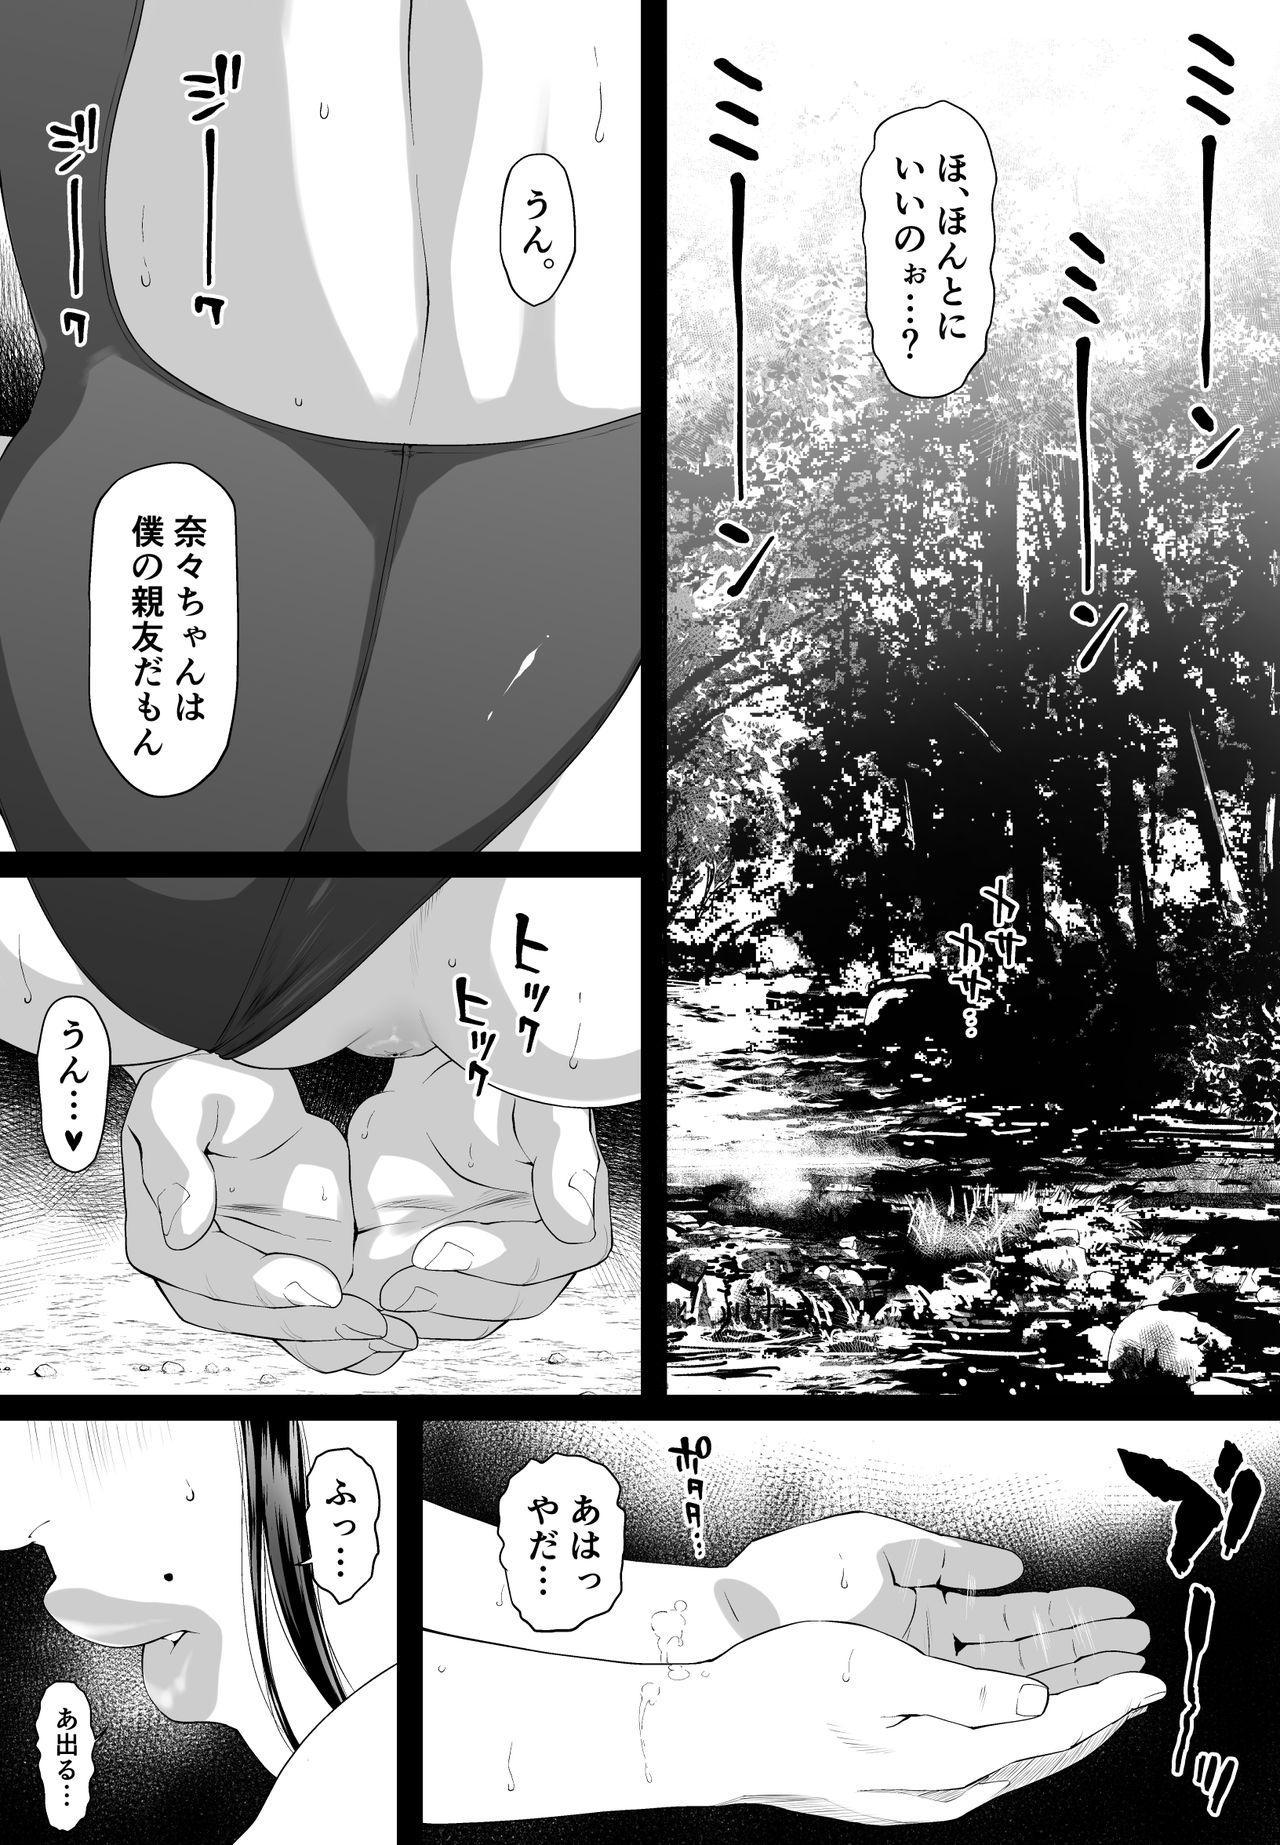 Mild Hentai NANA 6